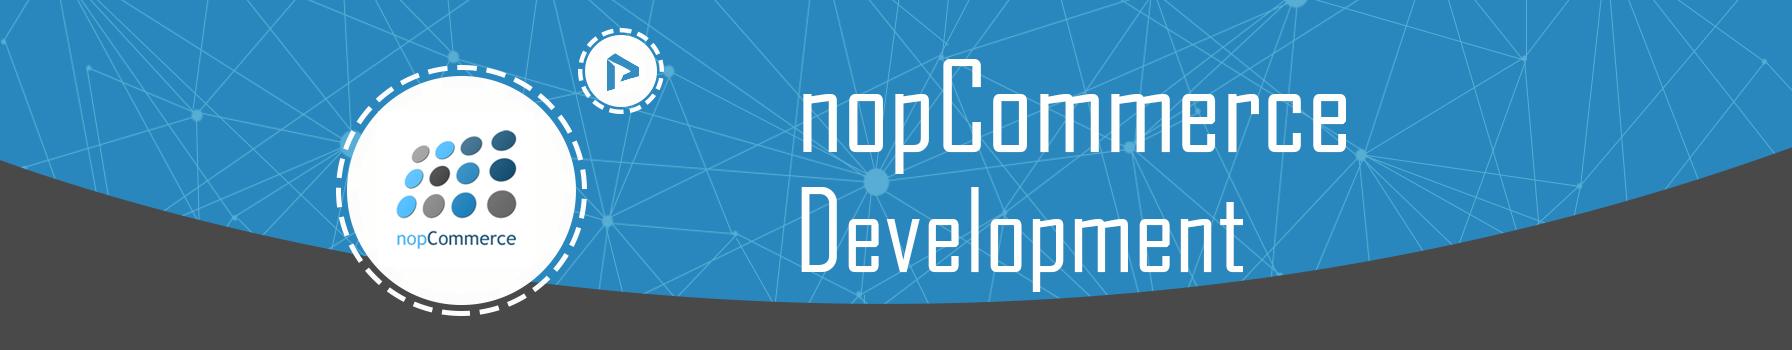 nopcommerce-development.png